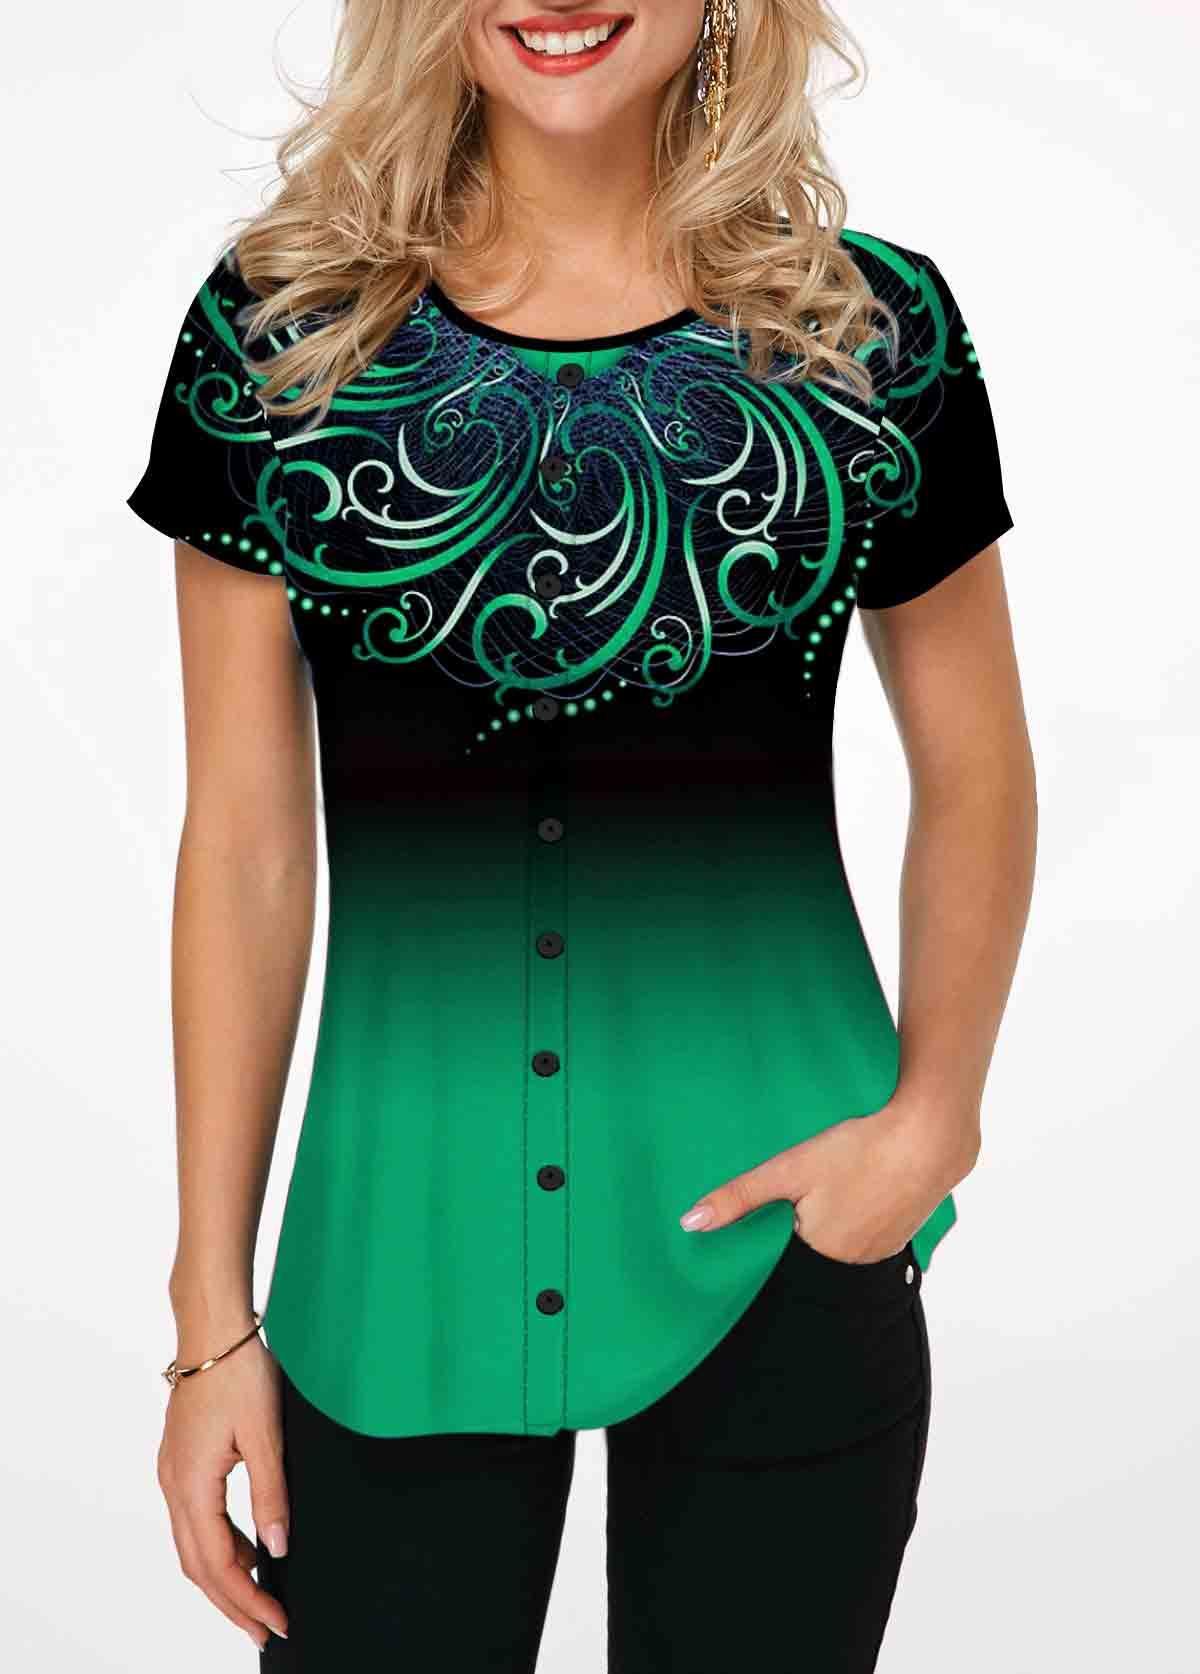 Tribal Print Round Neck Green T Shirt